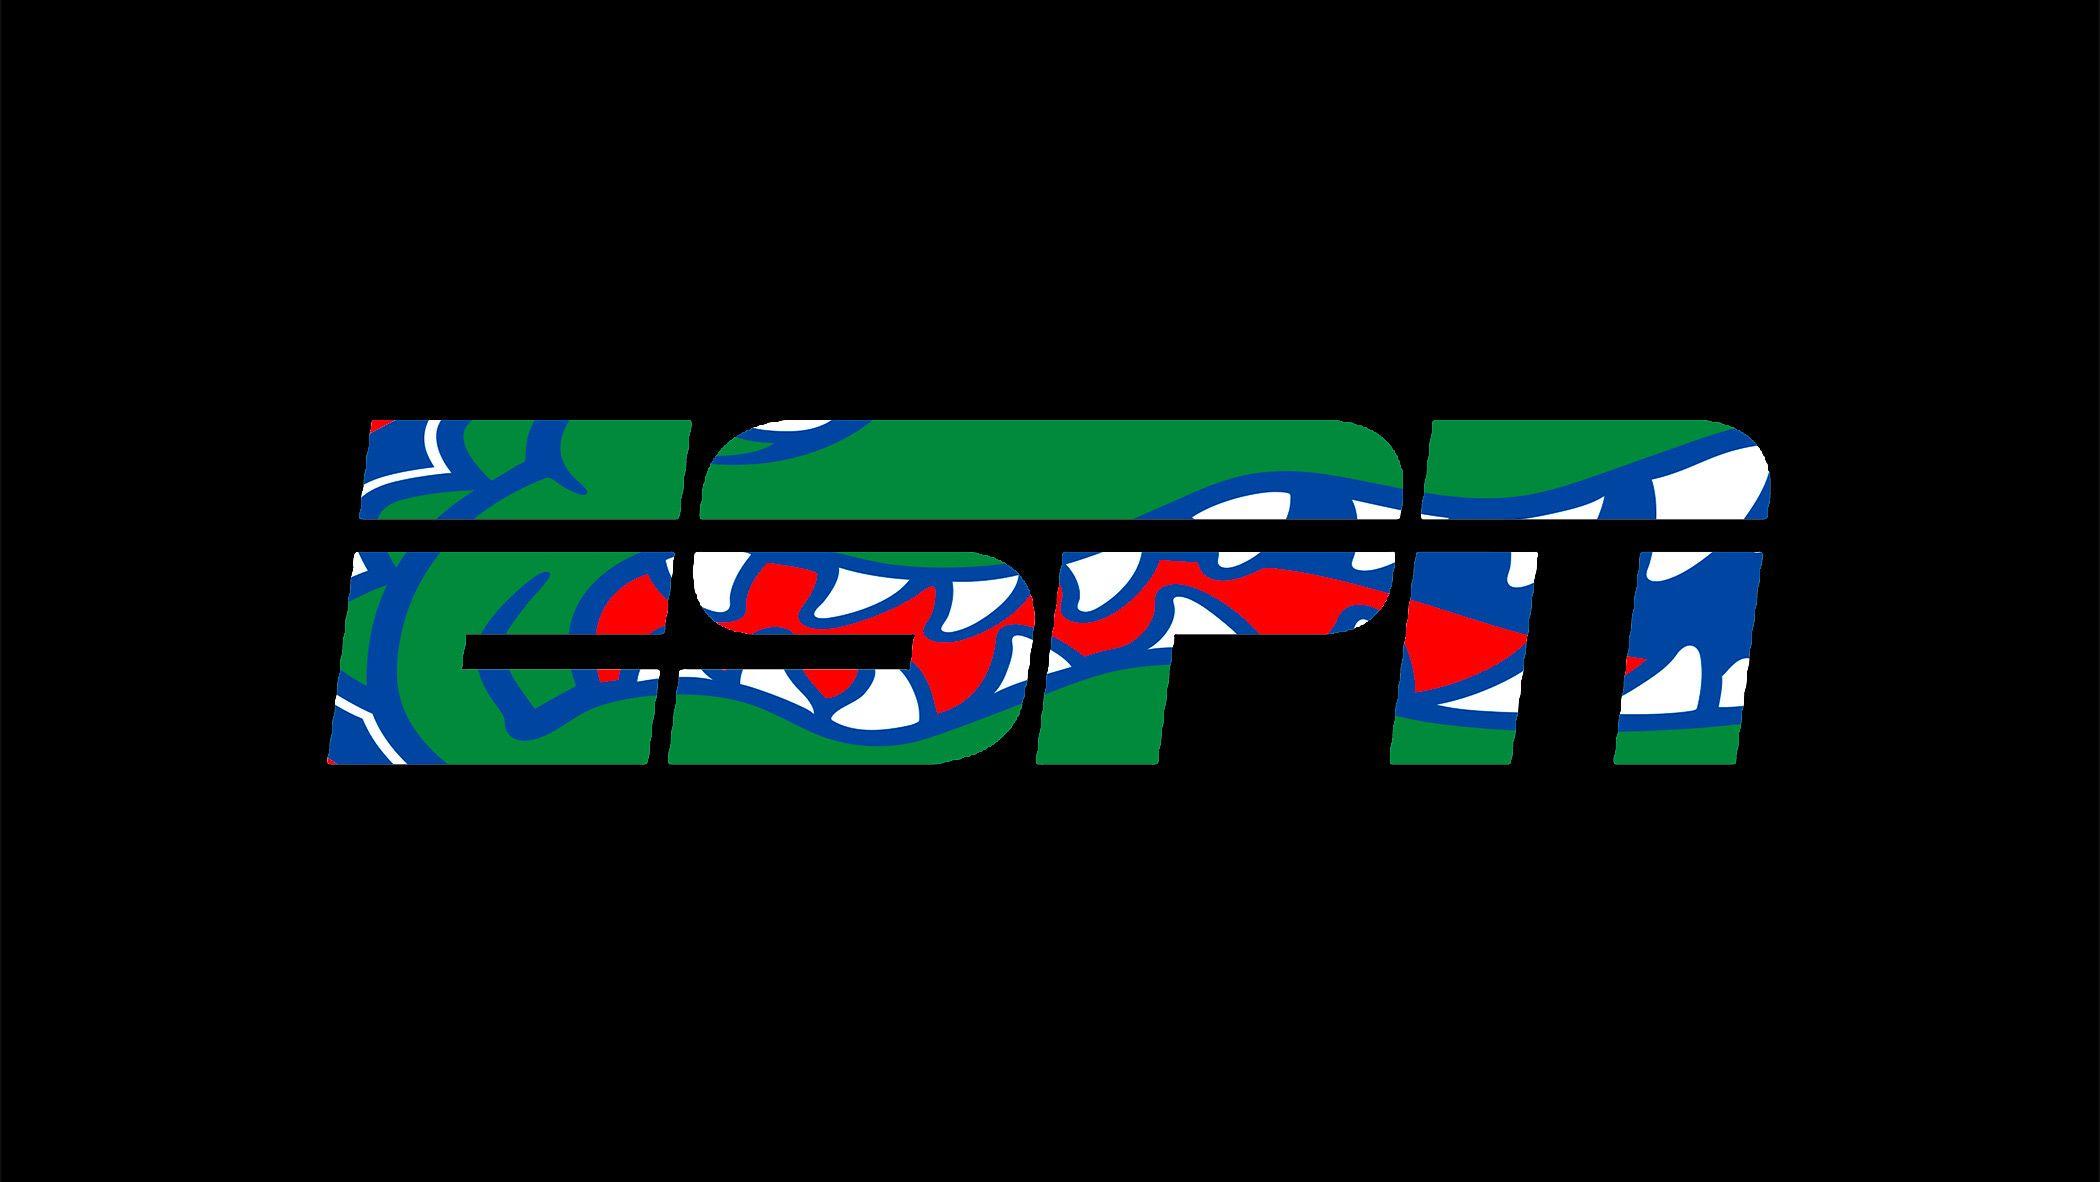 Espn logo with the Florida Gators logo inserted inside of